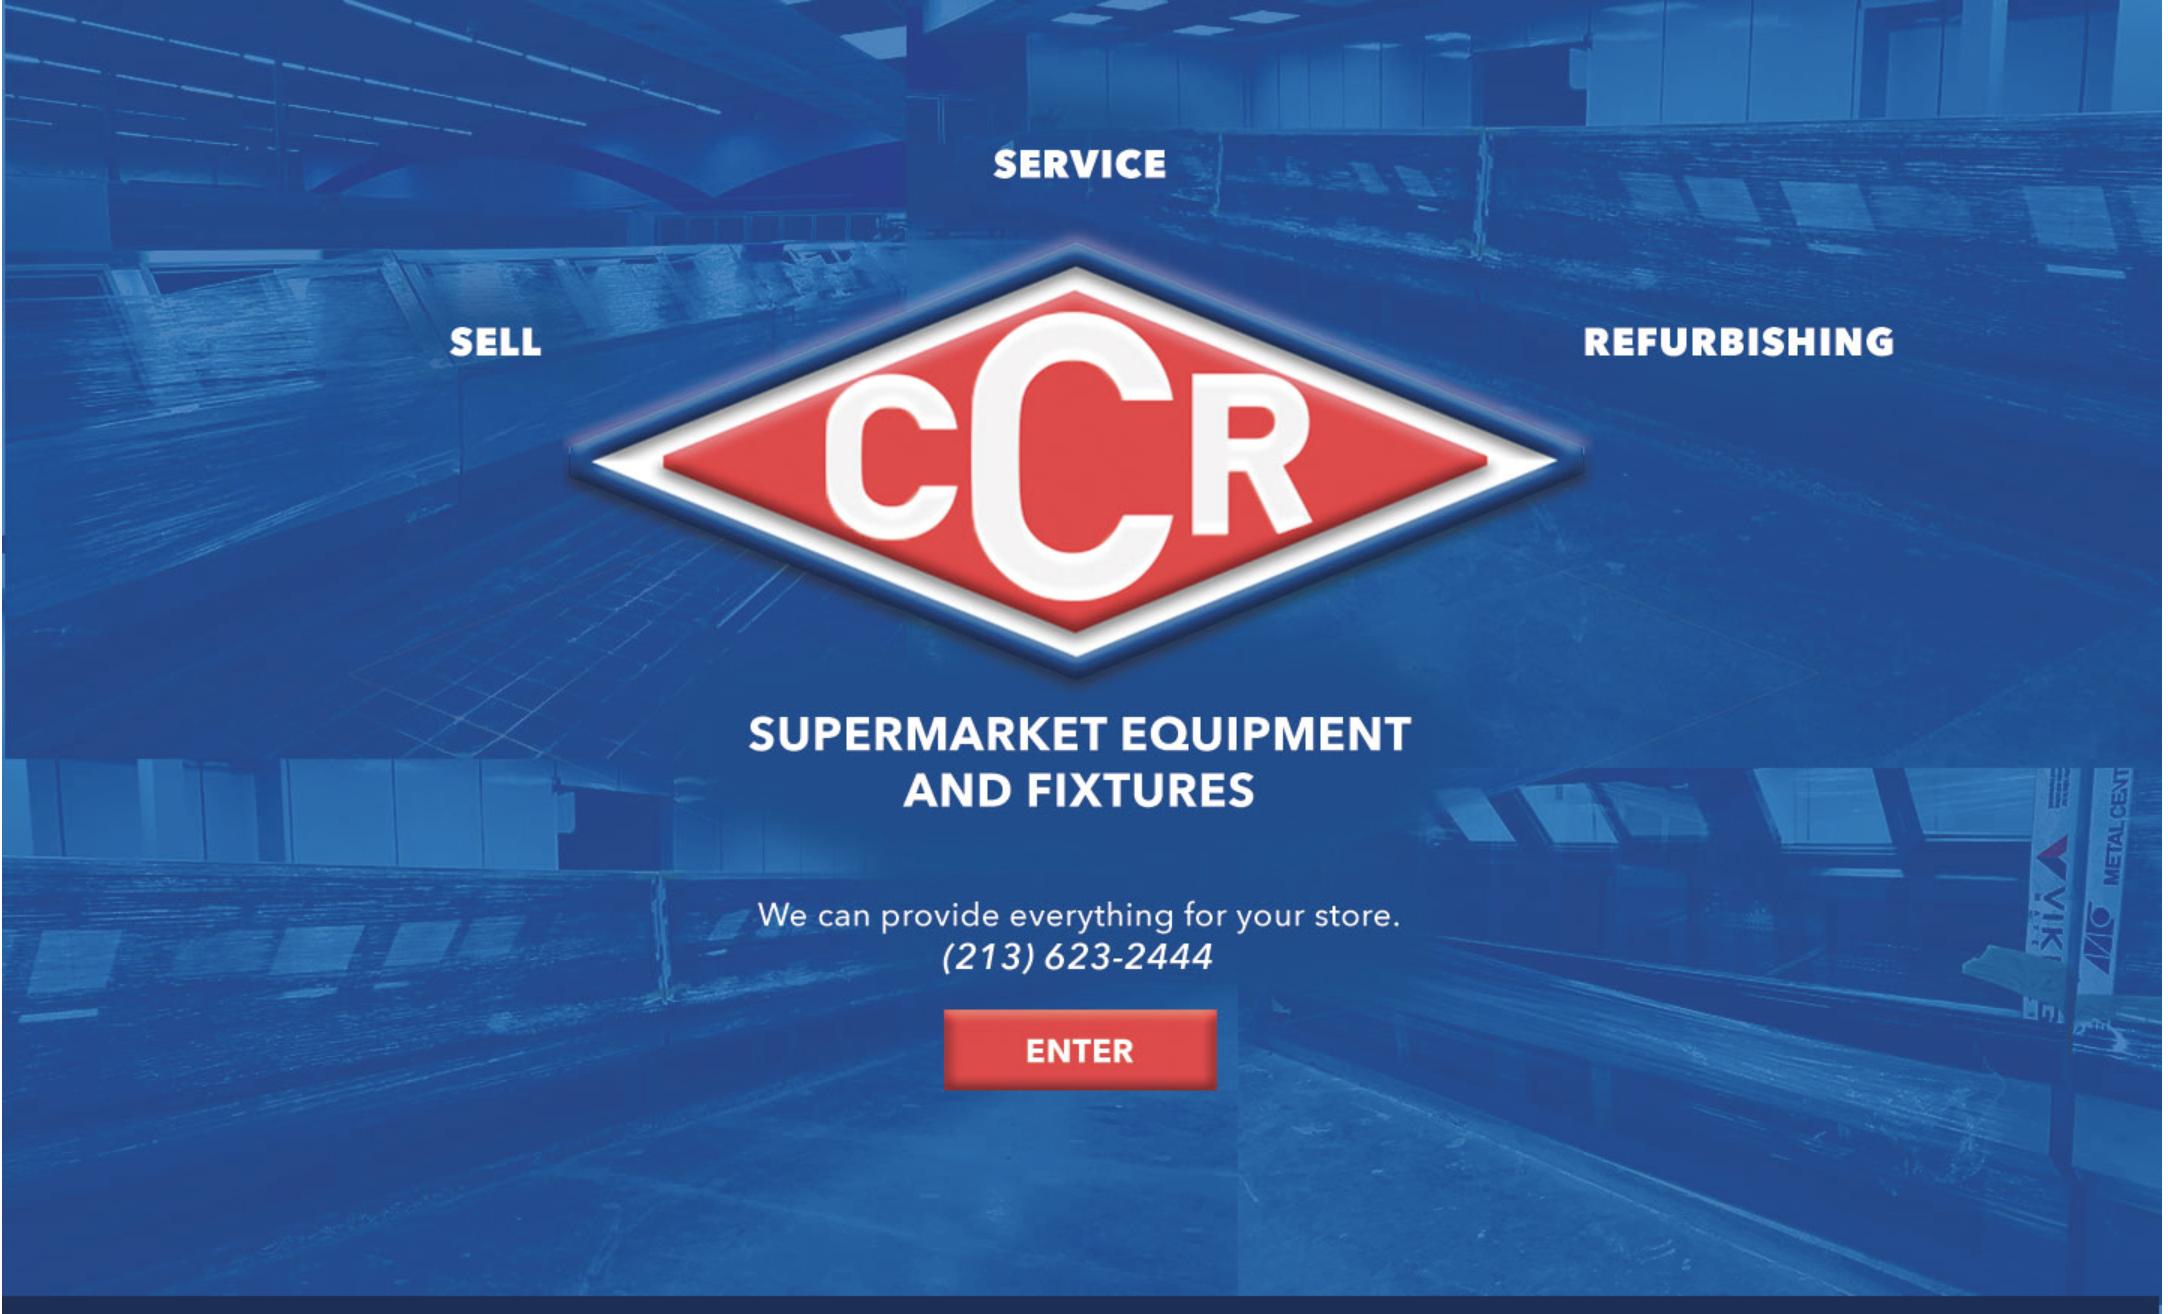 CCR Market equipment and Fixtures